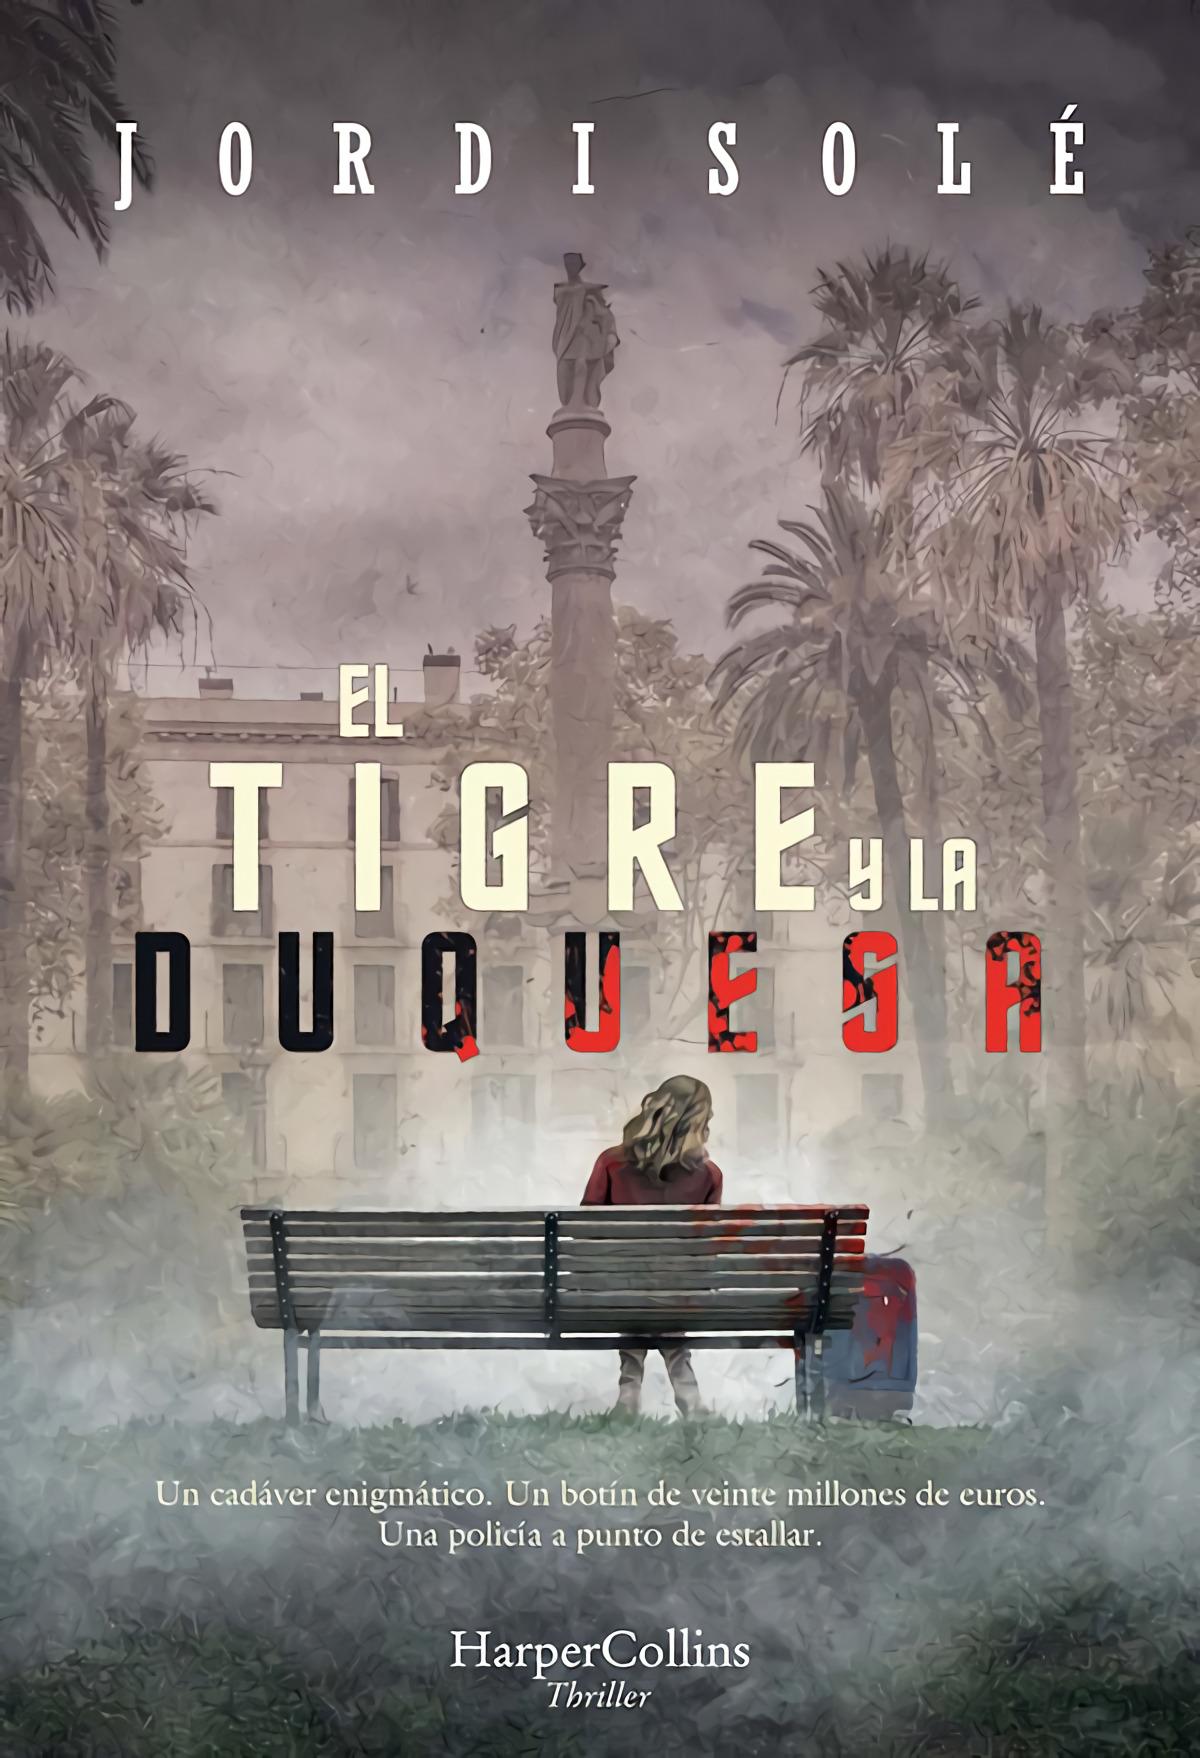 El tigre y la duquesa - Solé, Jordi